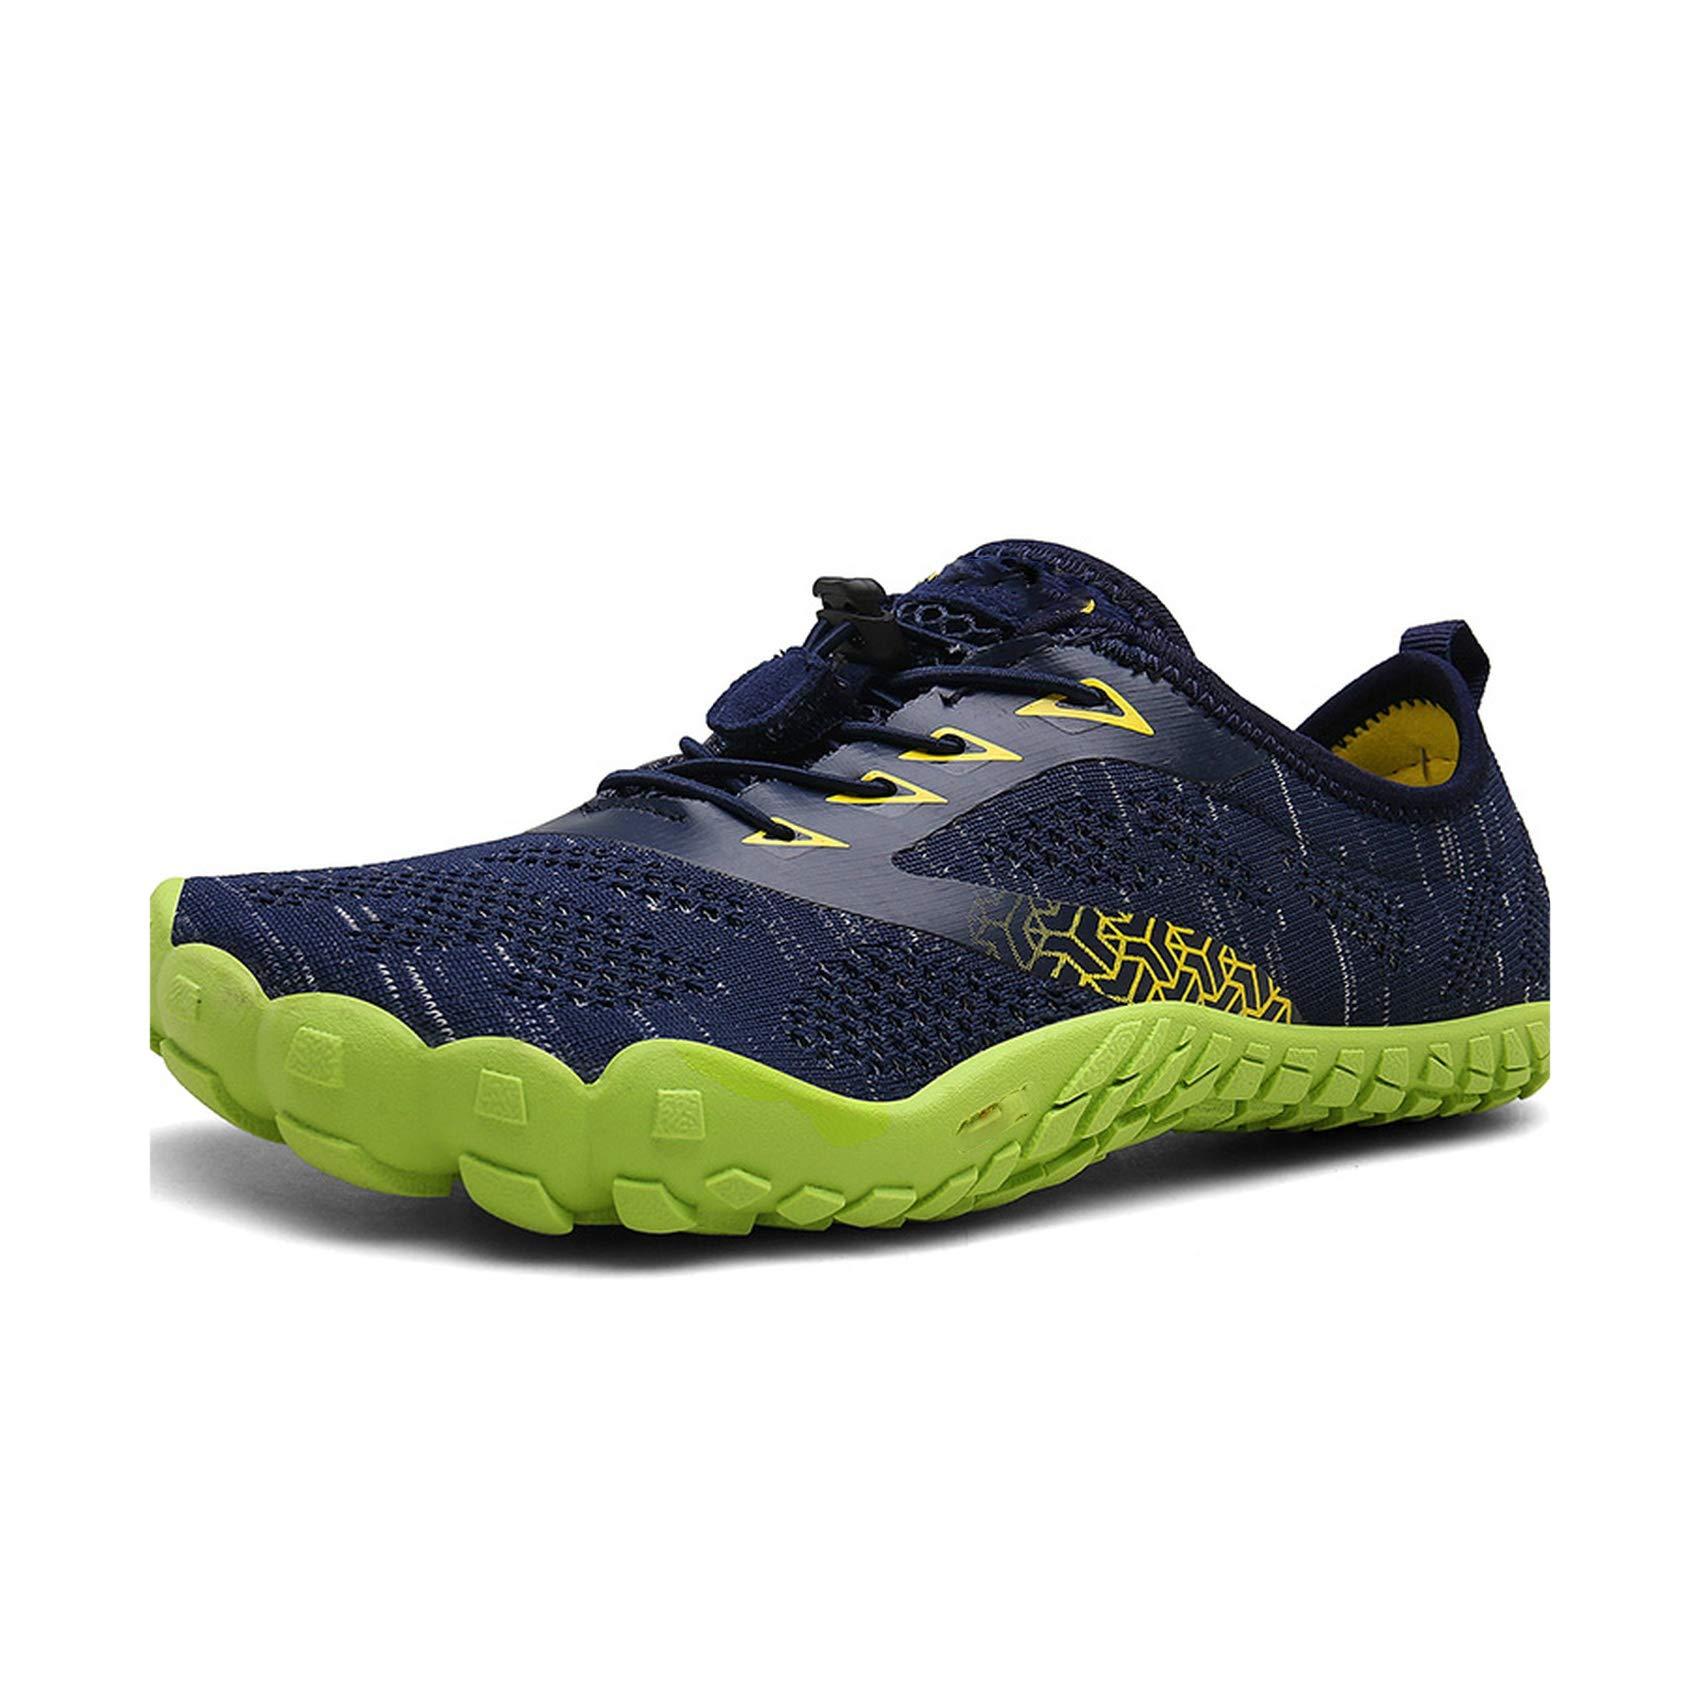 Big Big Beauty Men Water Shoes Woman Beach Sandals Breathable Diving Swimming Aqua Shoes,9.5 by Big Big Beauty